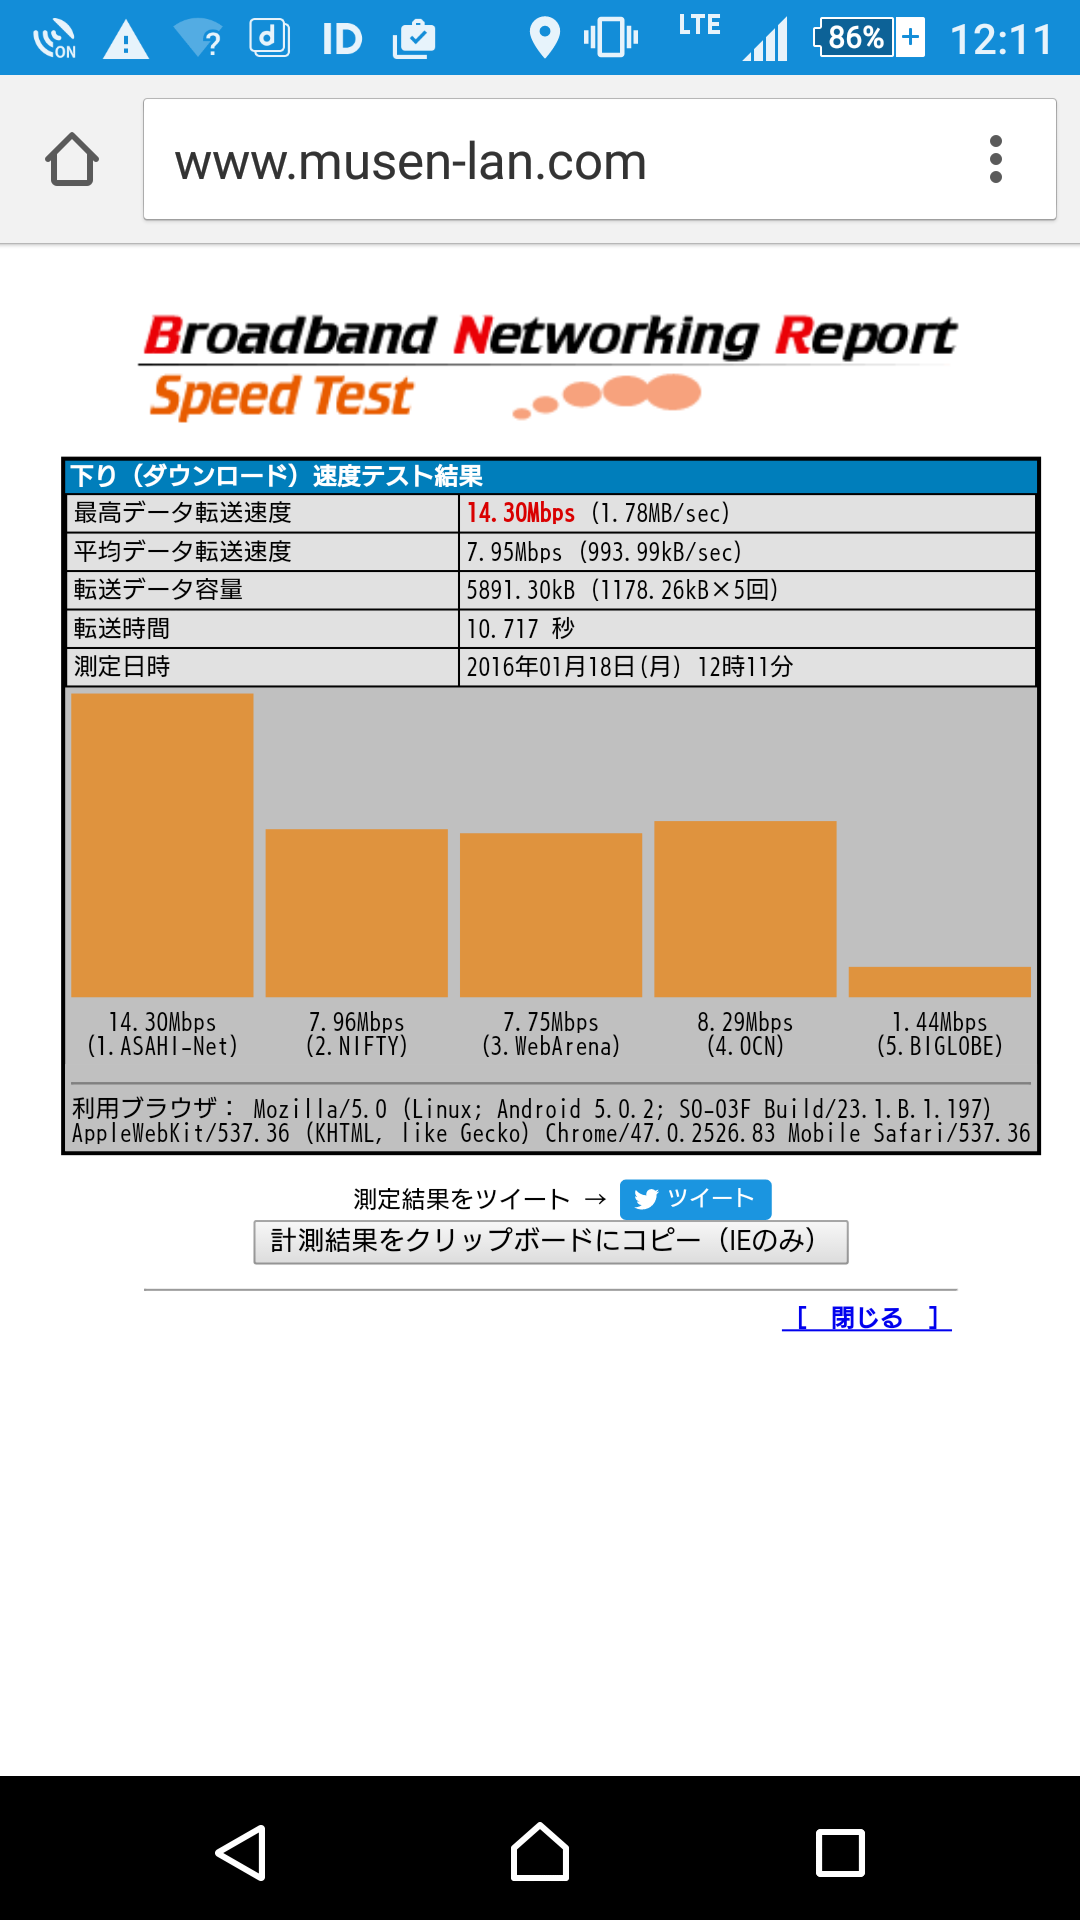 http://blogs.itmedia.co.jp/junmtd/images/freetel03.png